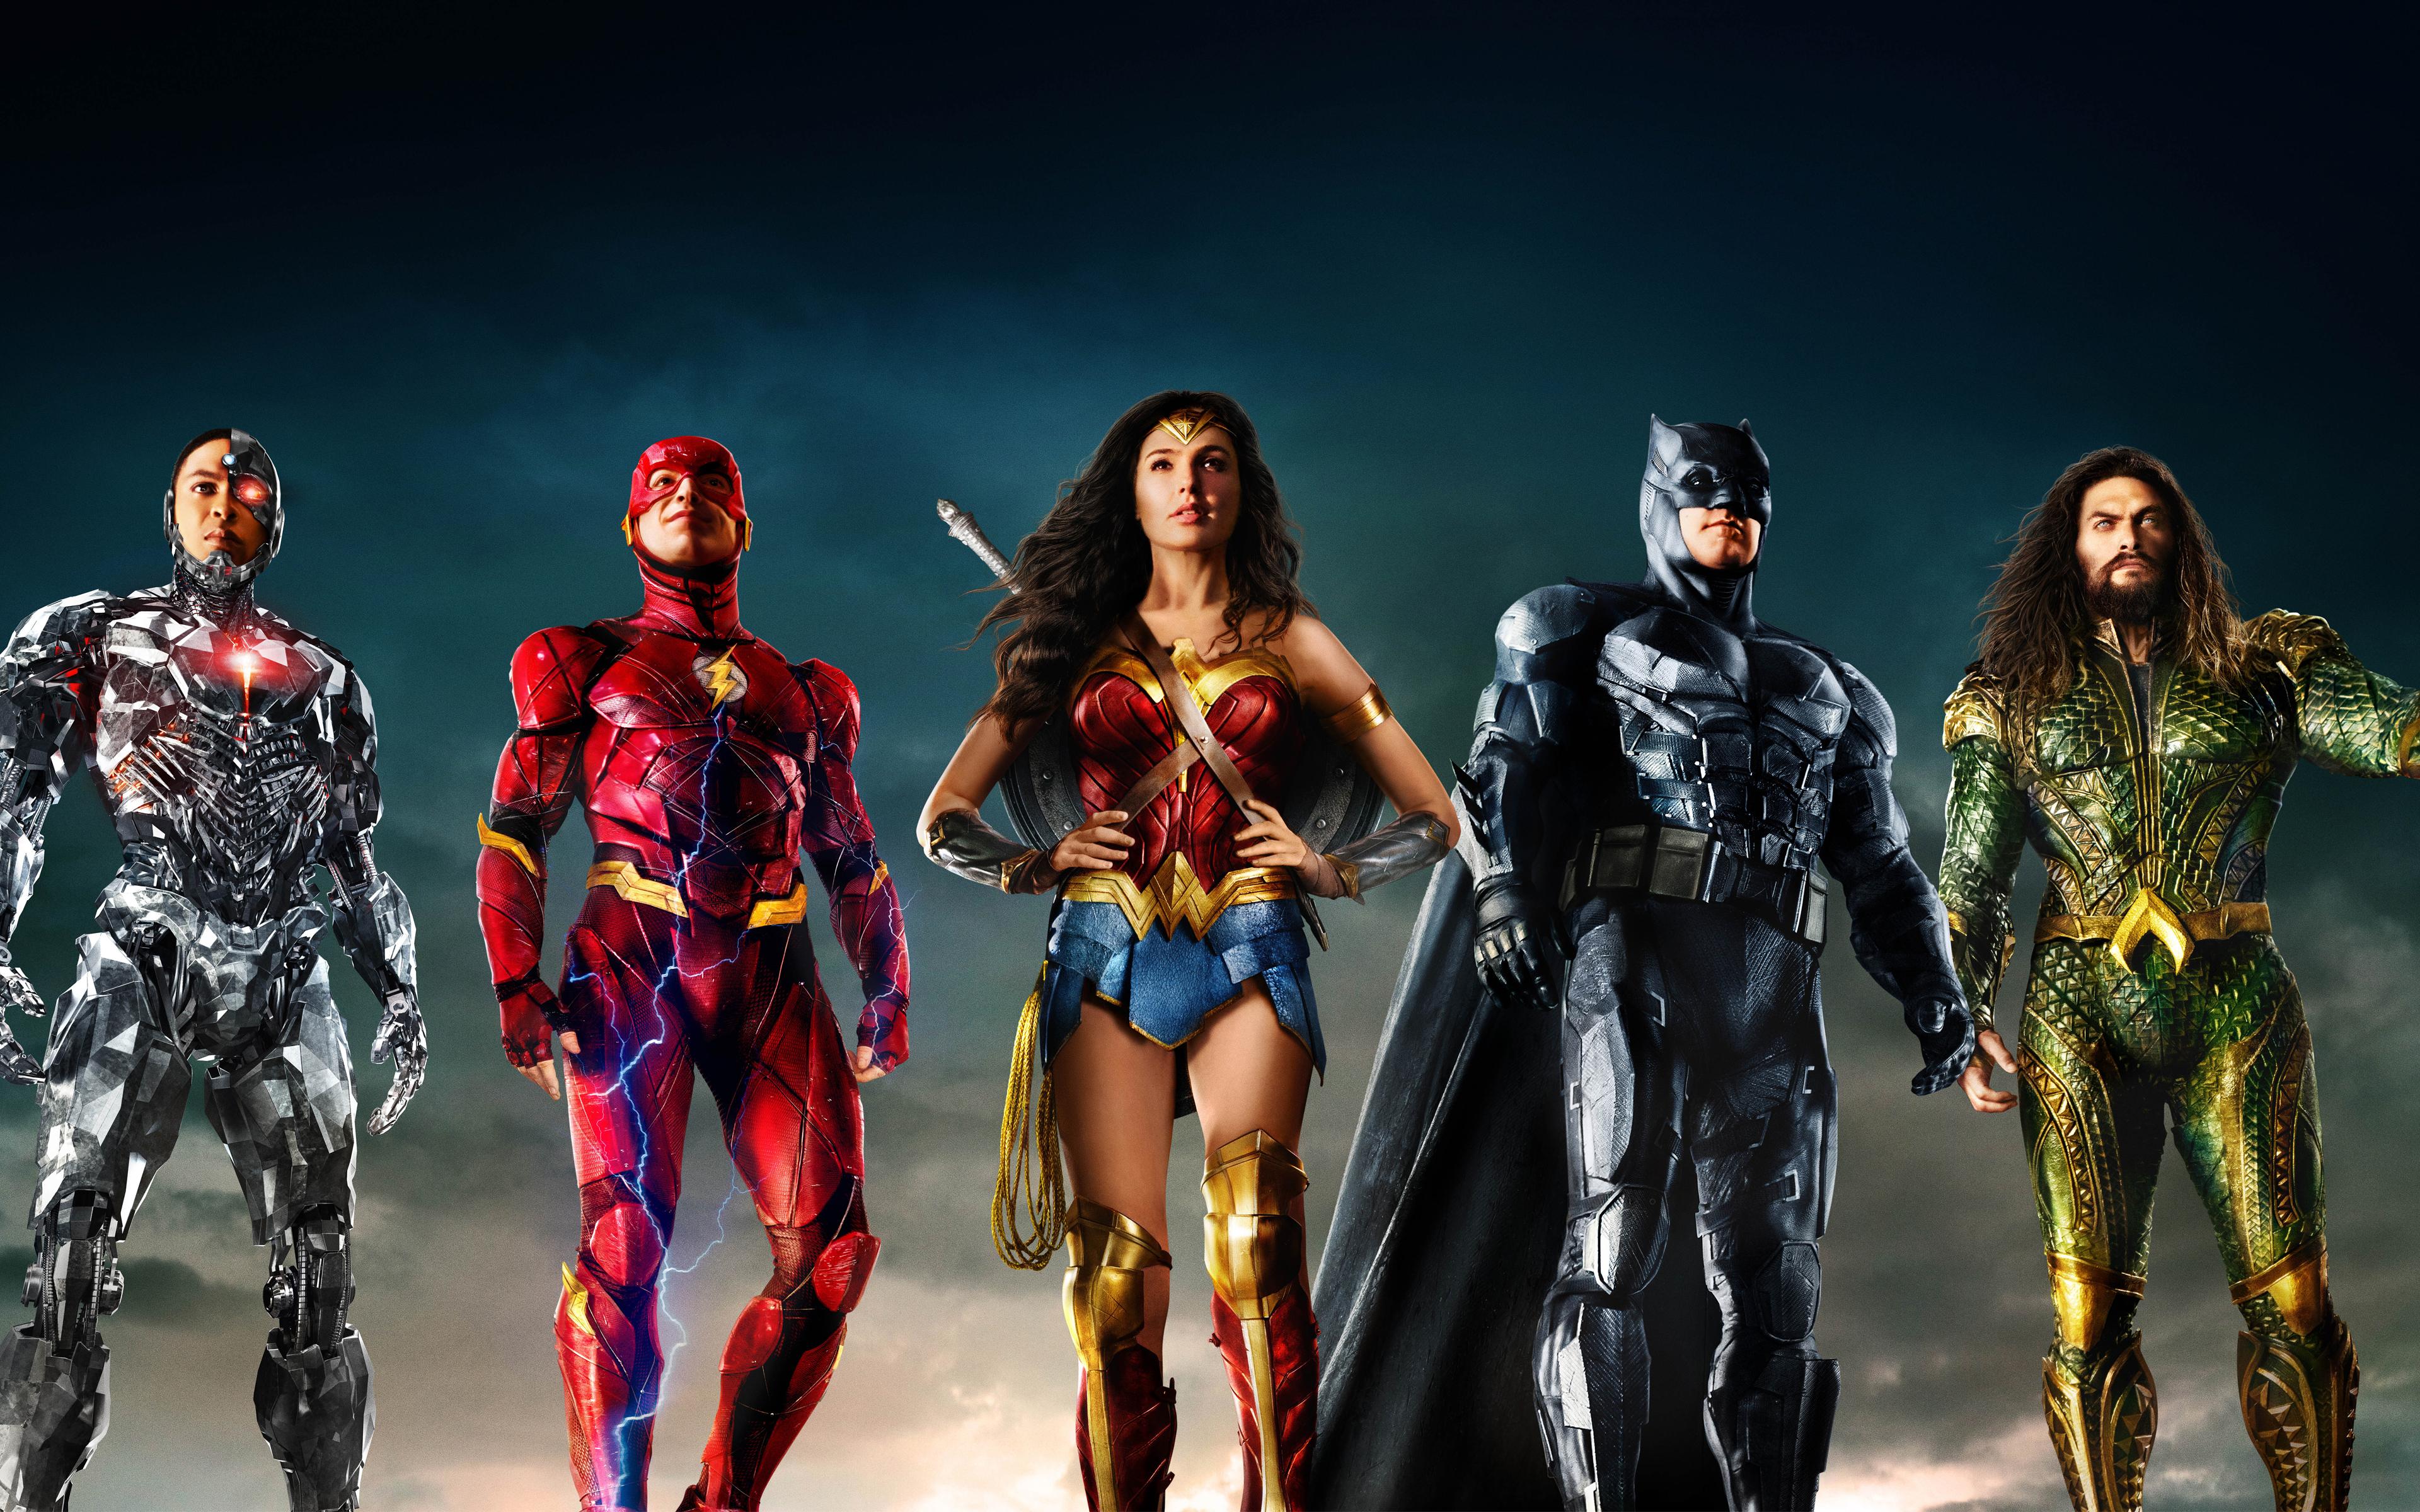 Must see Wallpaper Movie Justice League - 881066  Trends_42754.jpg